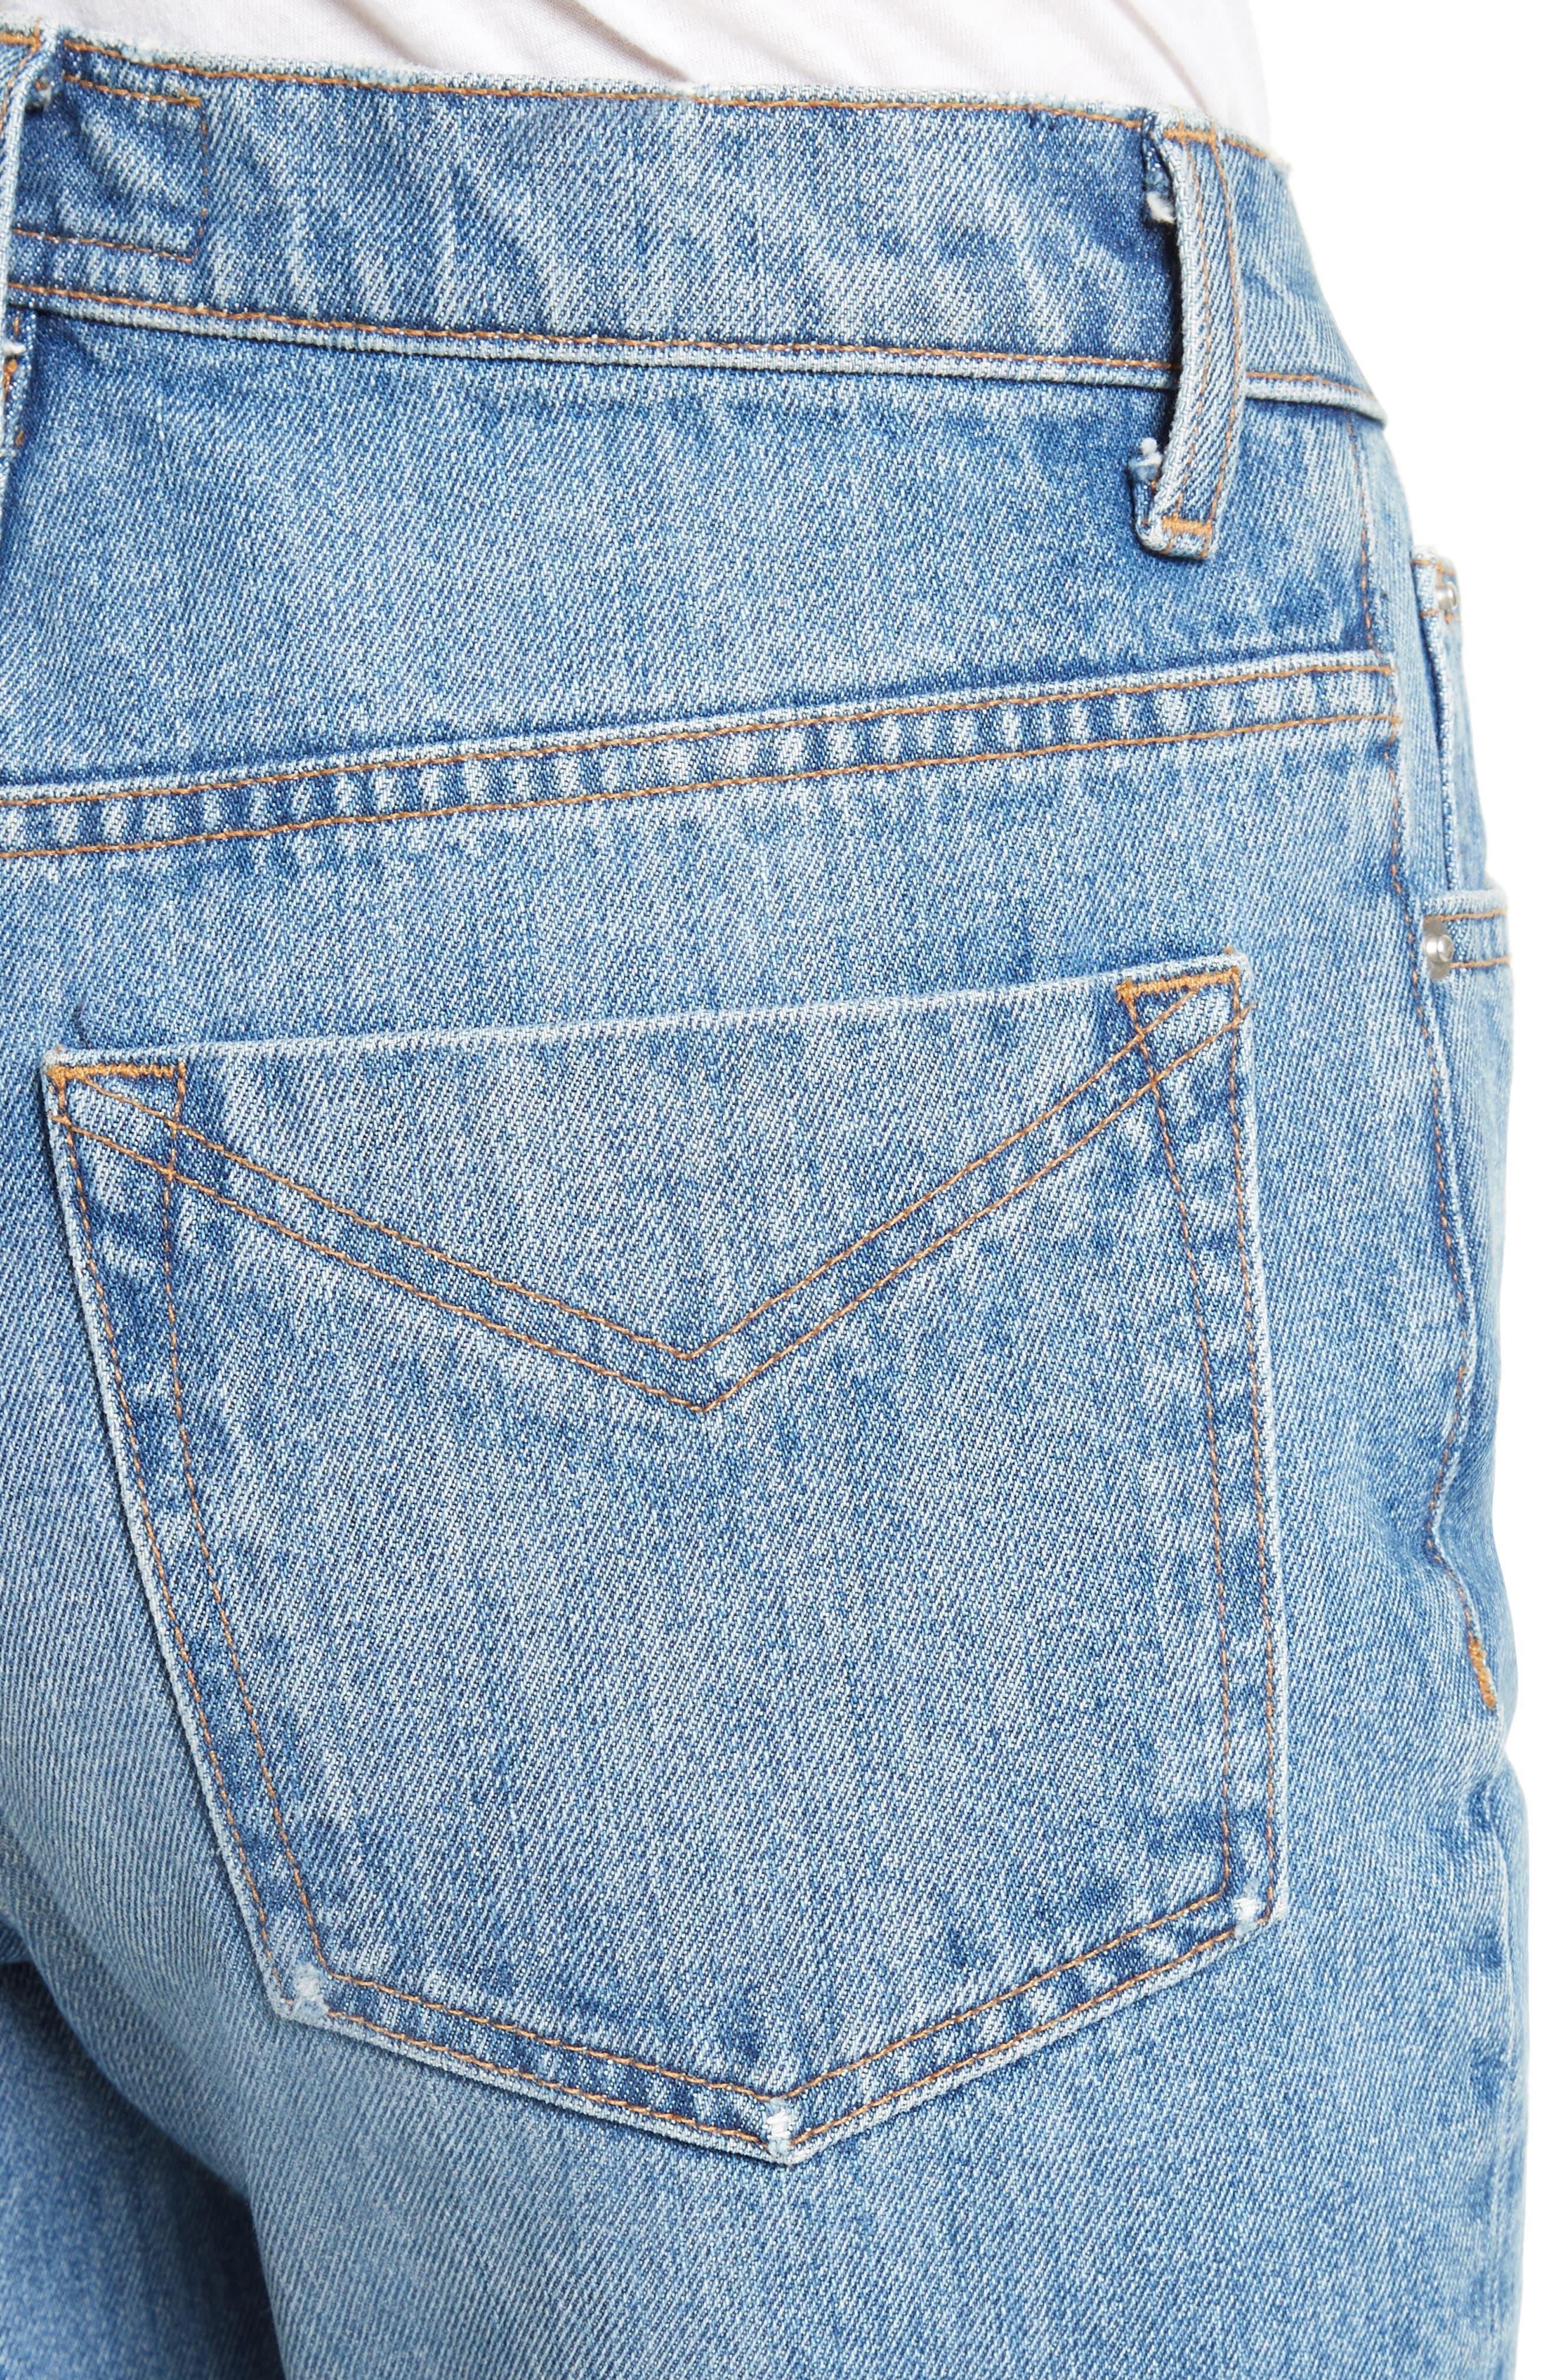 Lou High Waist Jeans,                             Alternate thumbnail 4, color,                             458